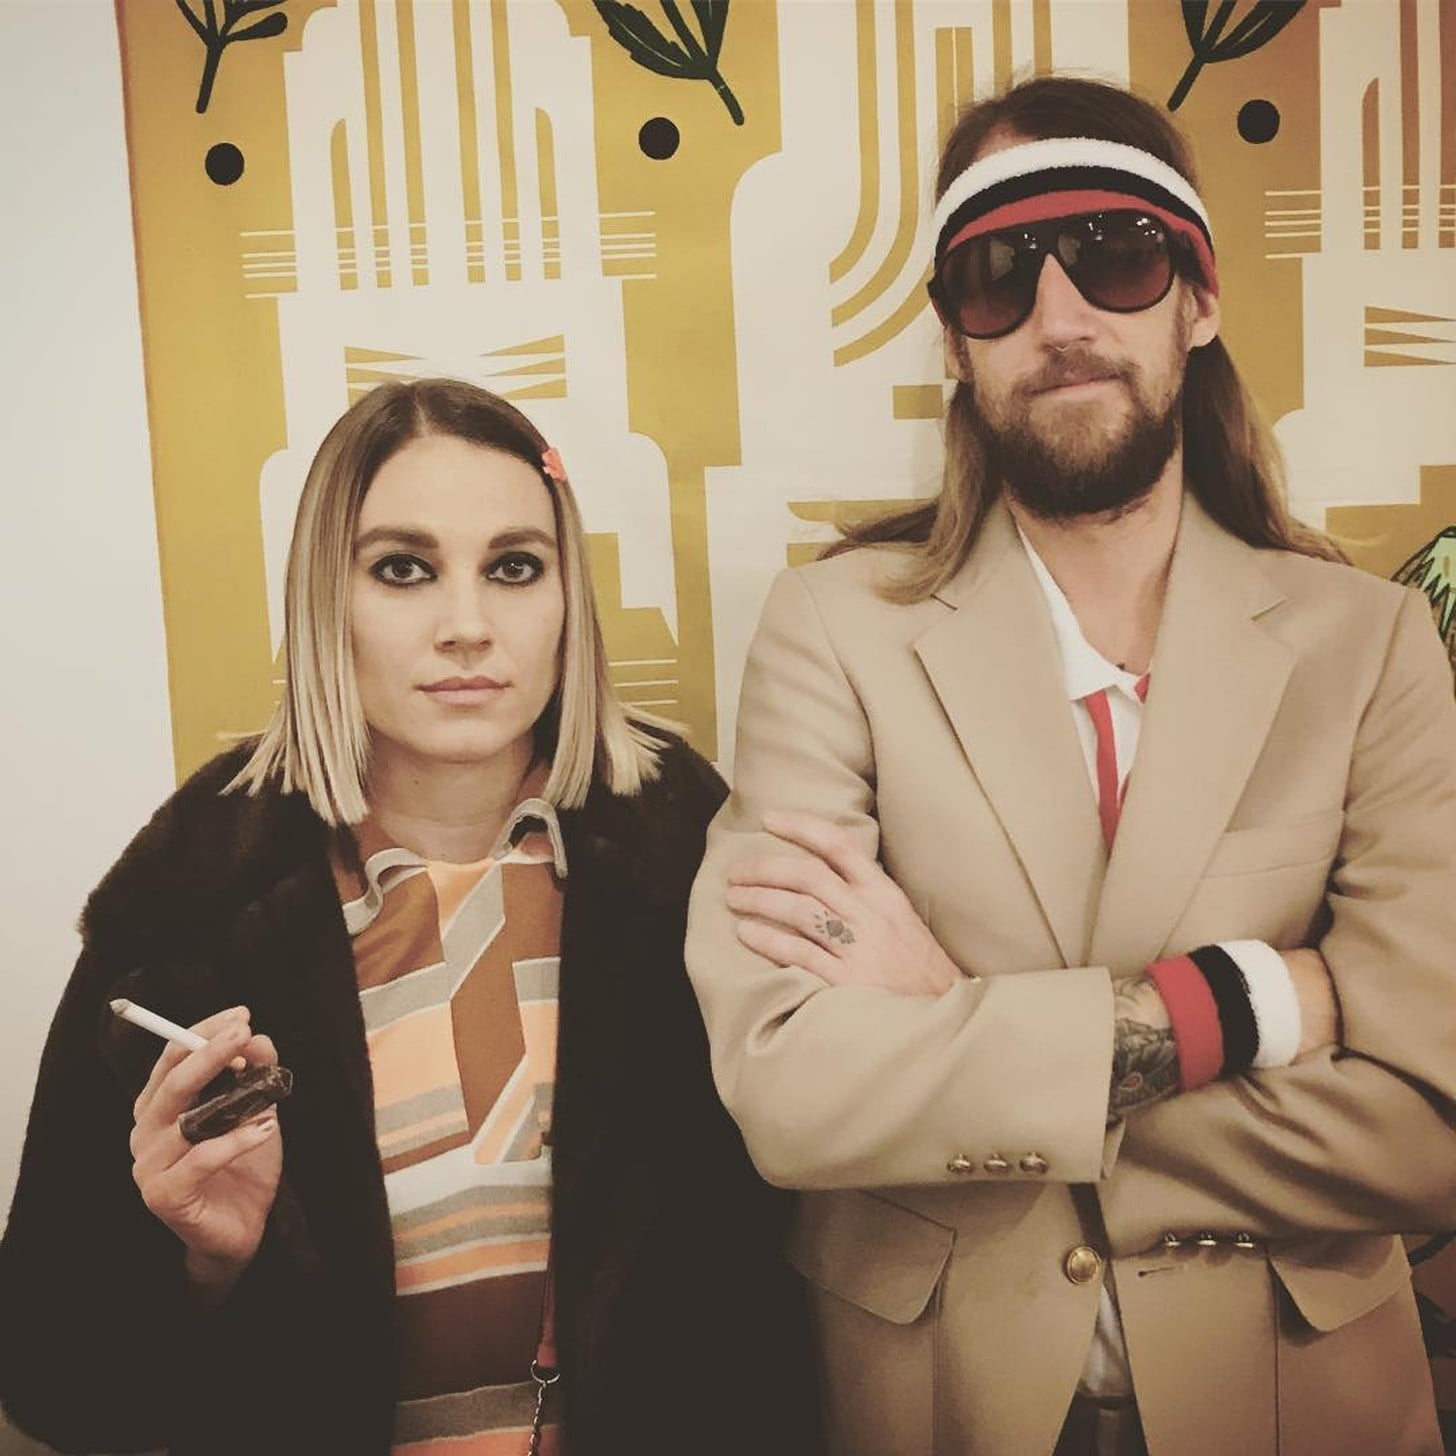 sc 1 st  Popsugar & Cheap Couples Costumes   POPSUGAR Smart Living